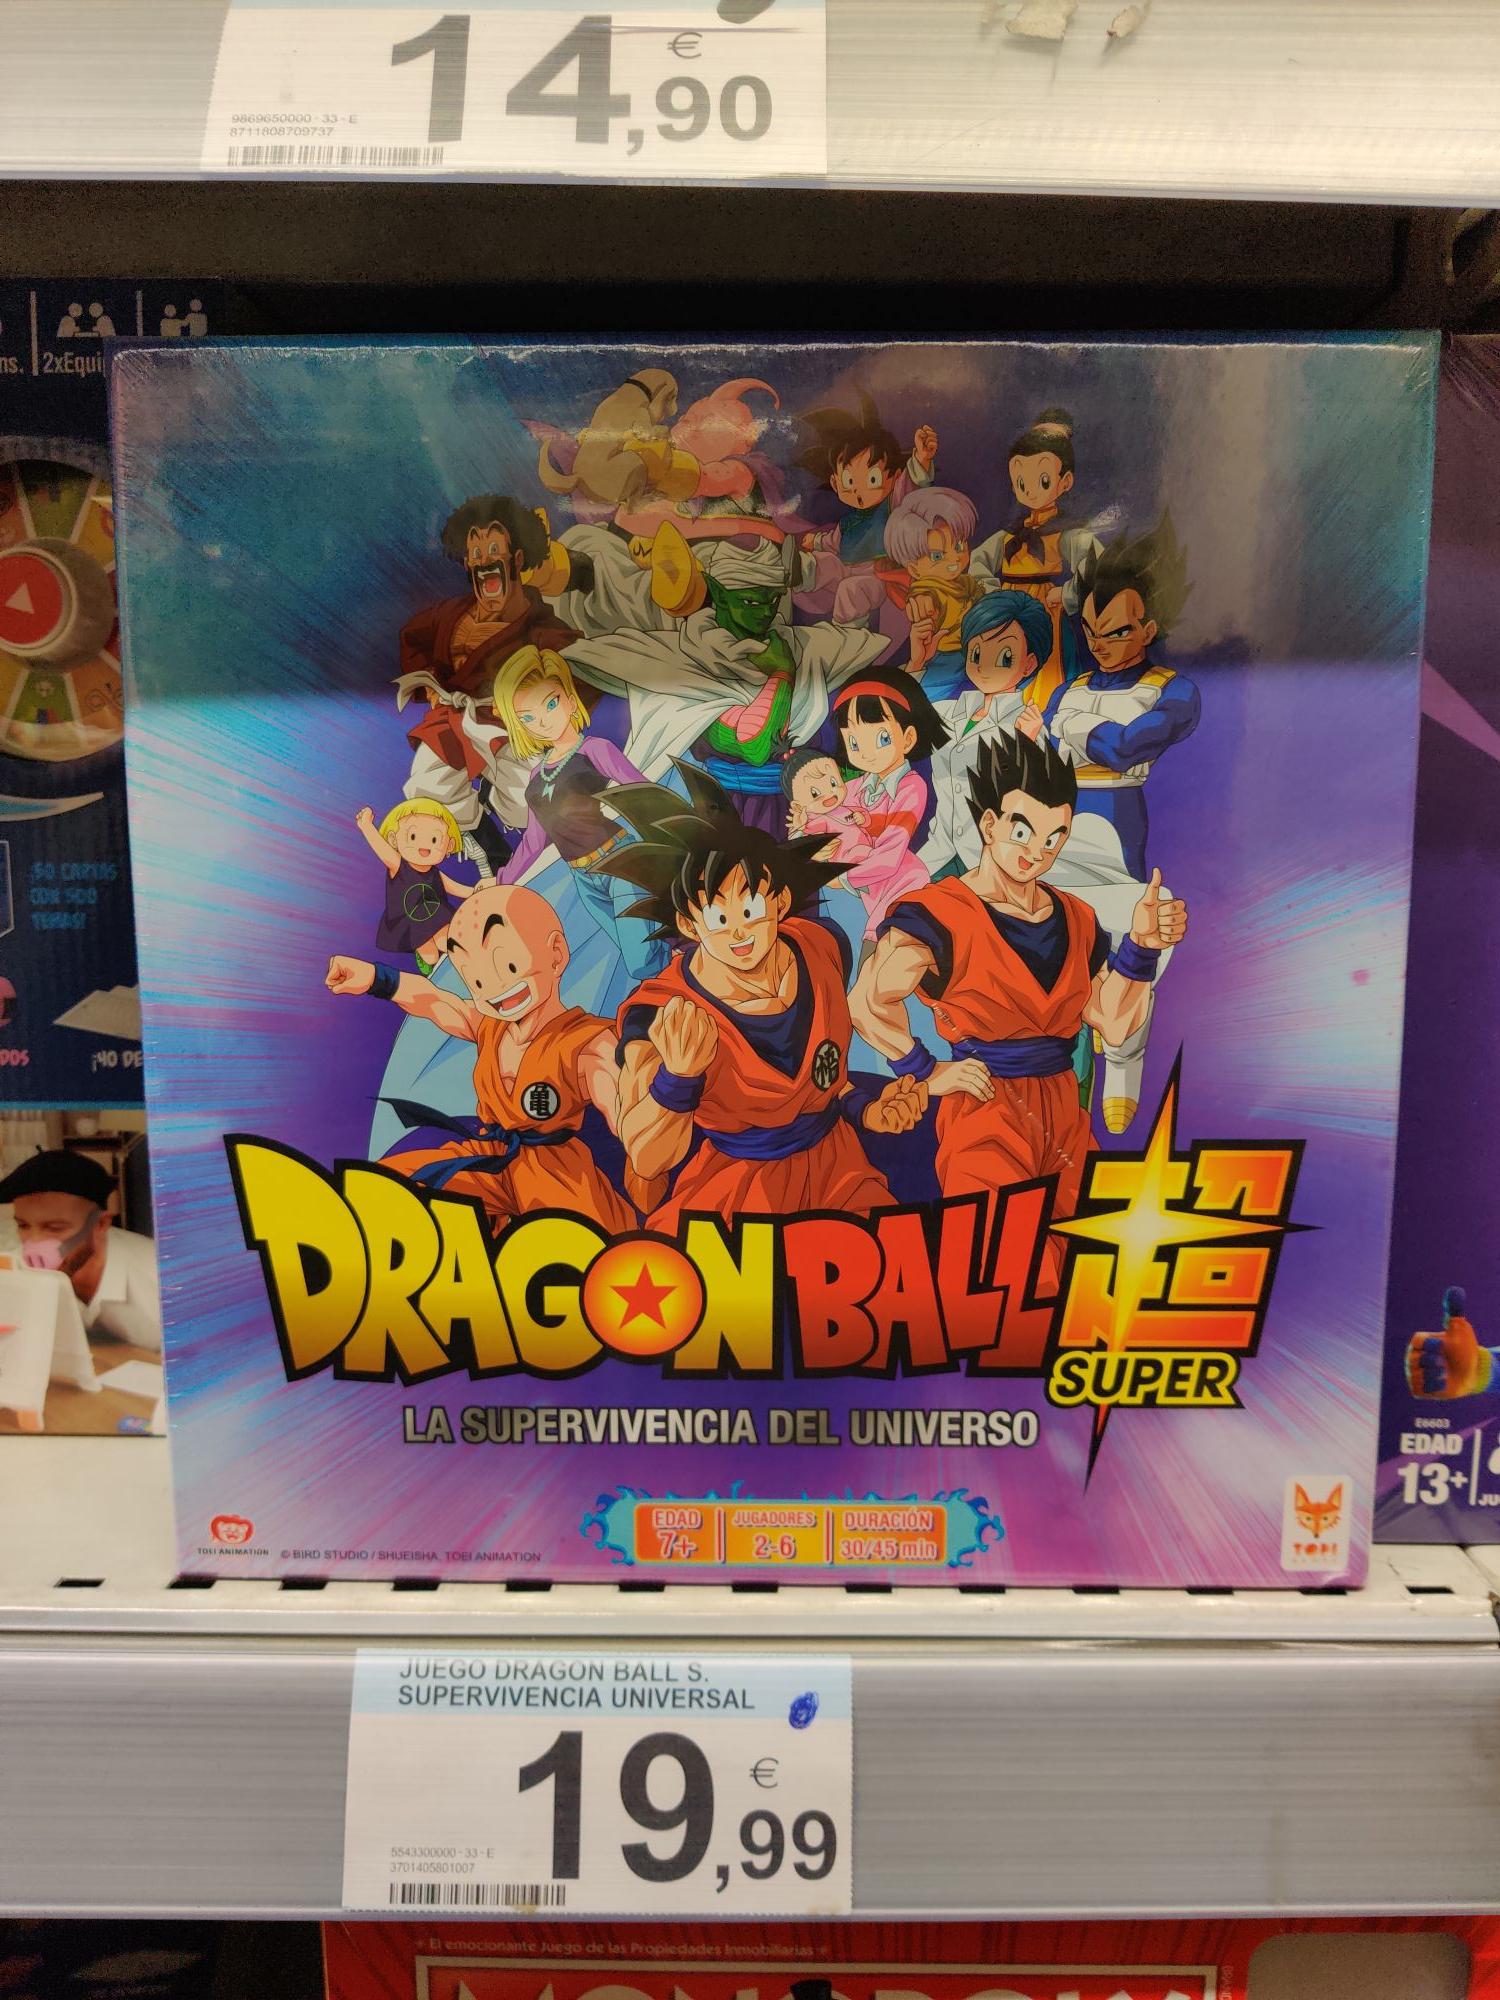 Dragon Ball Super - La supervivencia del universo, juego de mesa. En Carrefour de Vigo